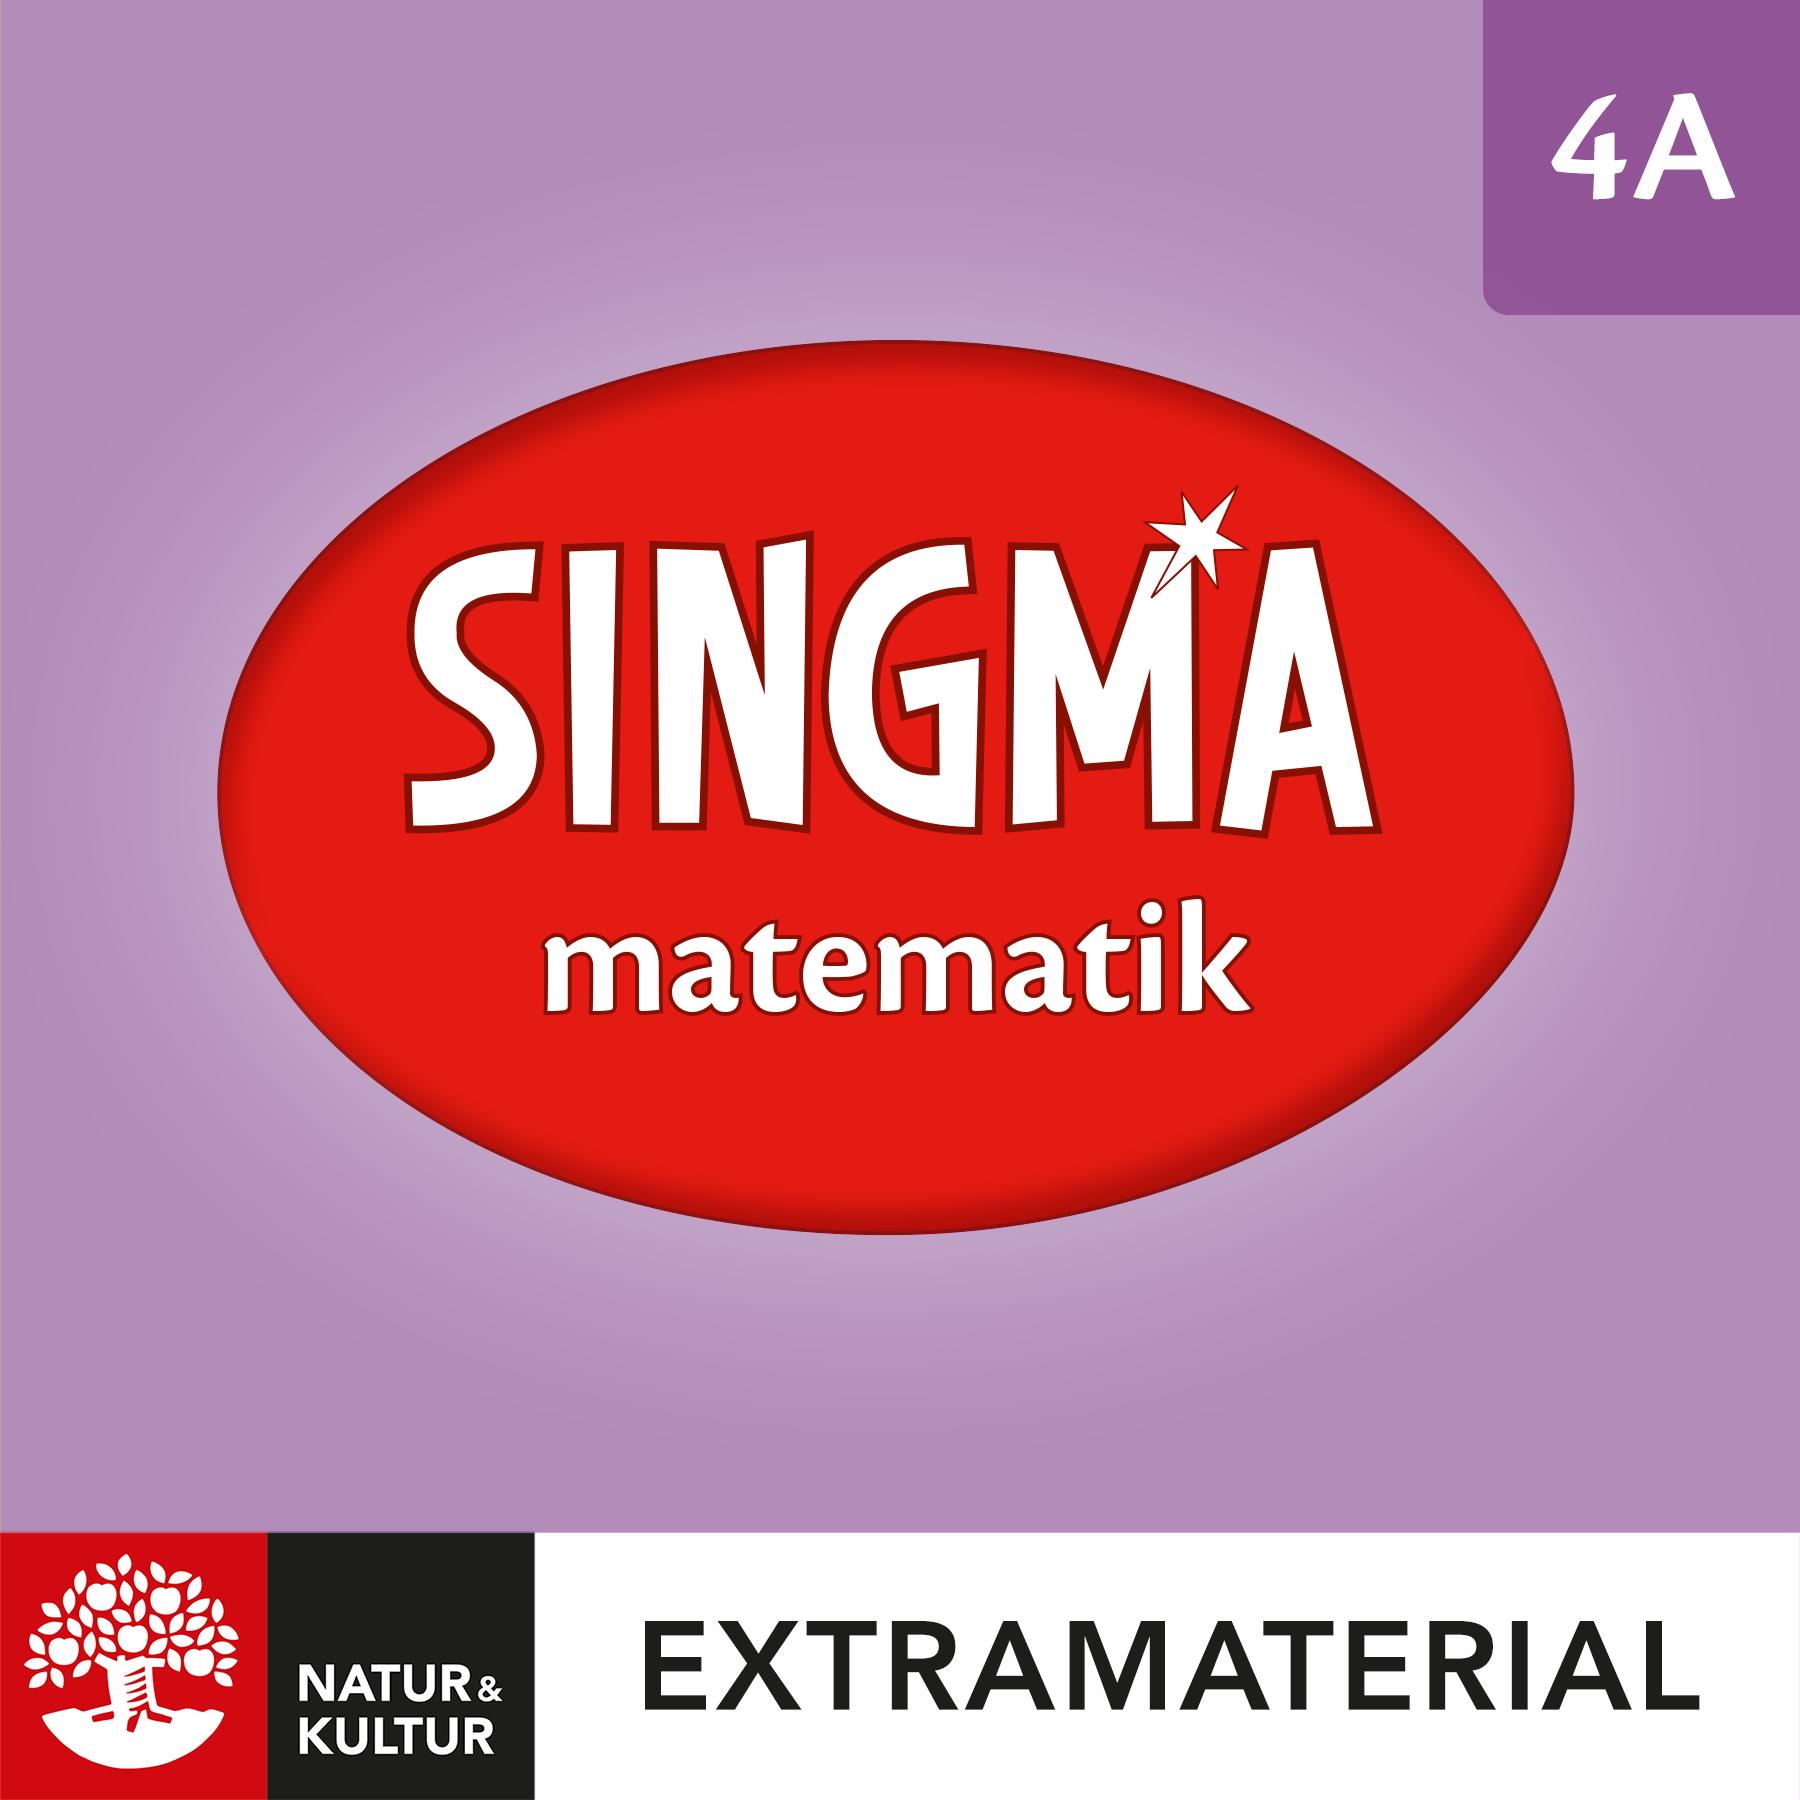 Singma matematik 4A